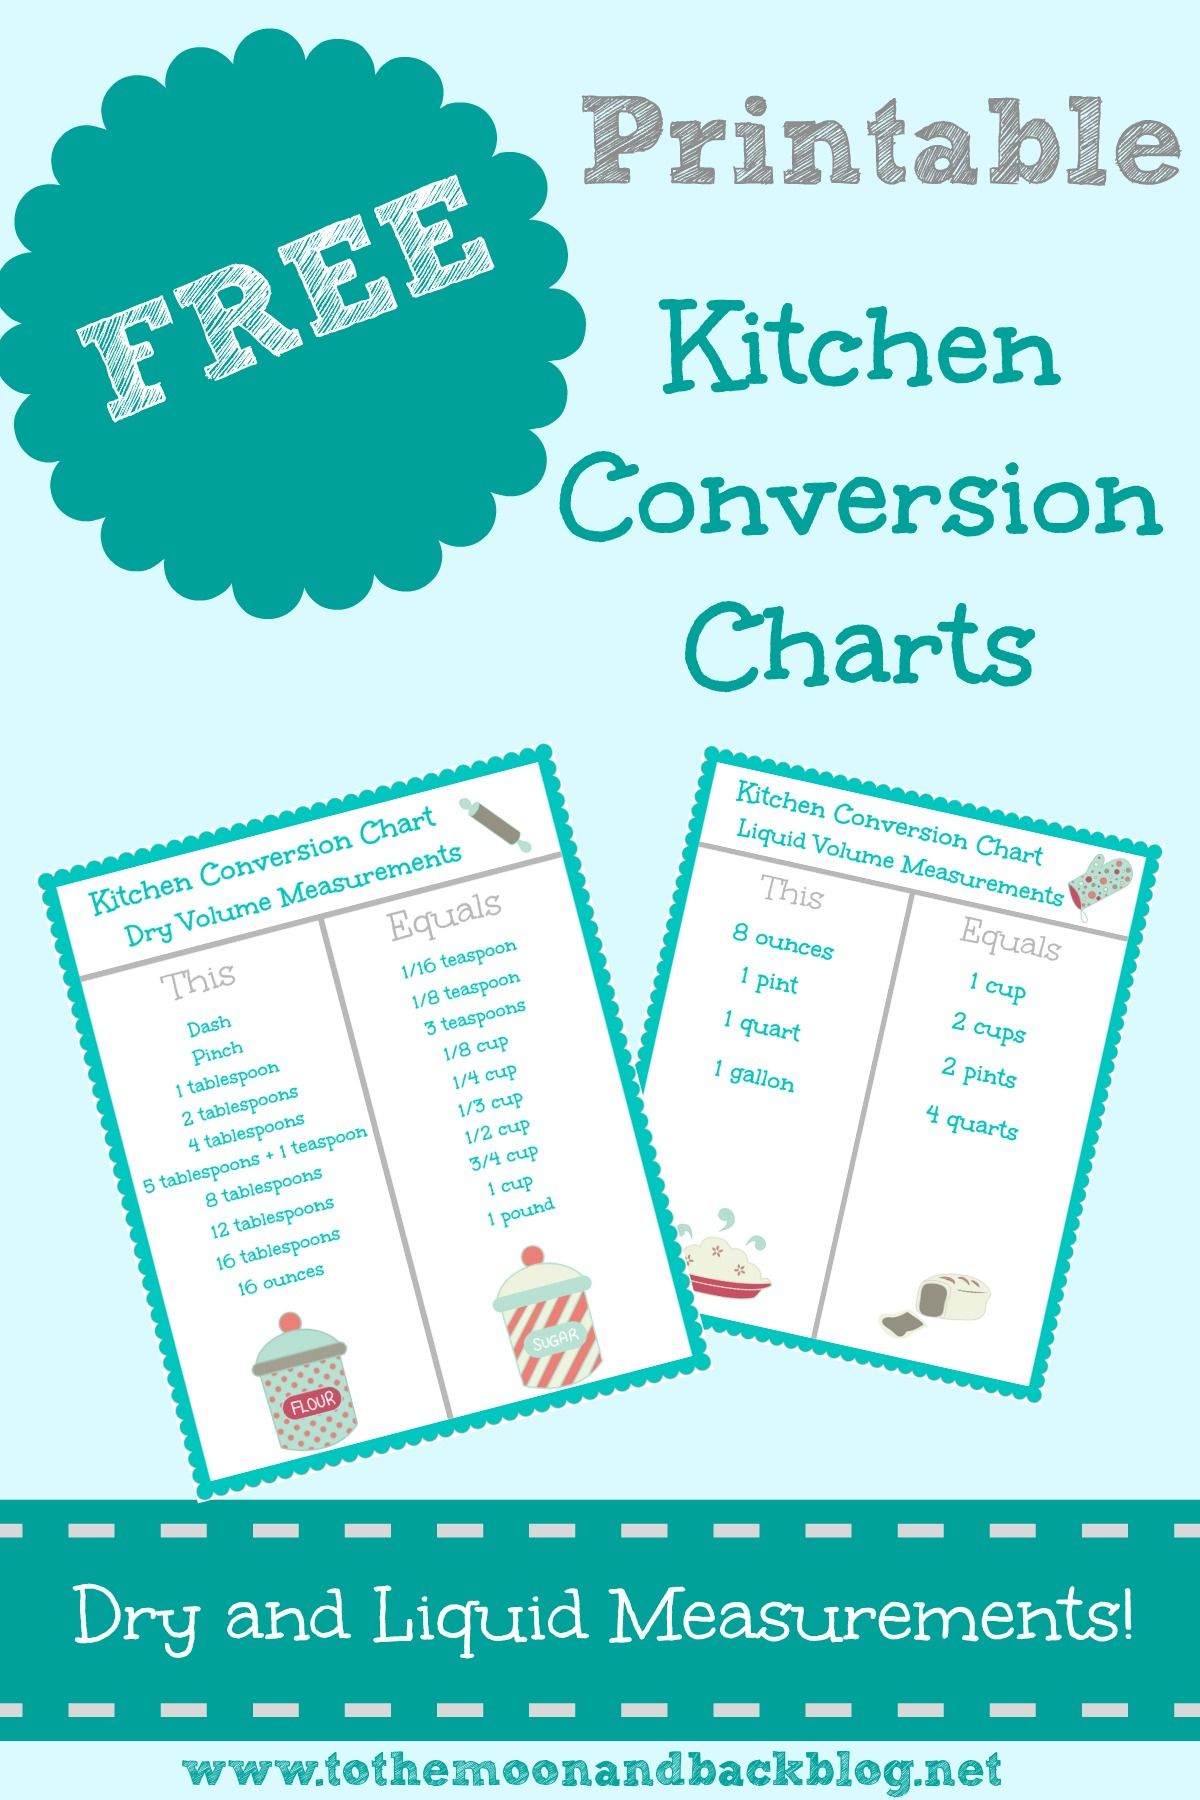 Free Printable Kitchen Conversion Charts